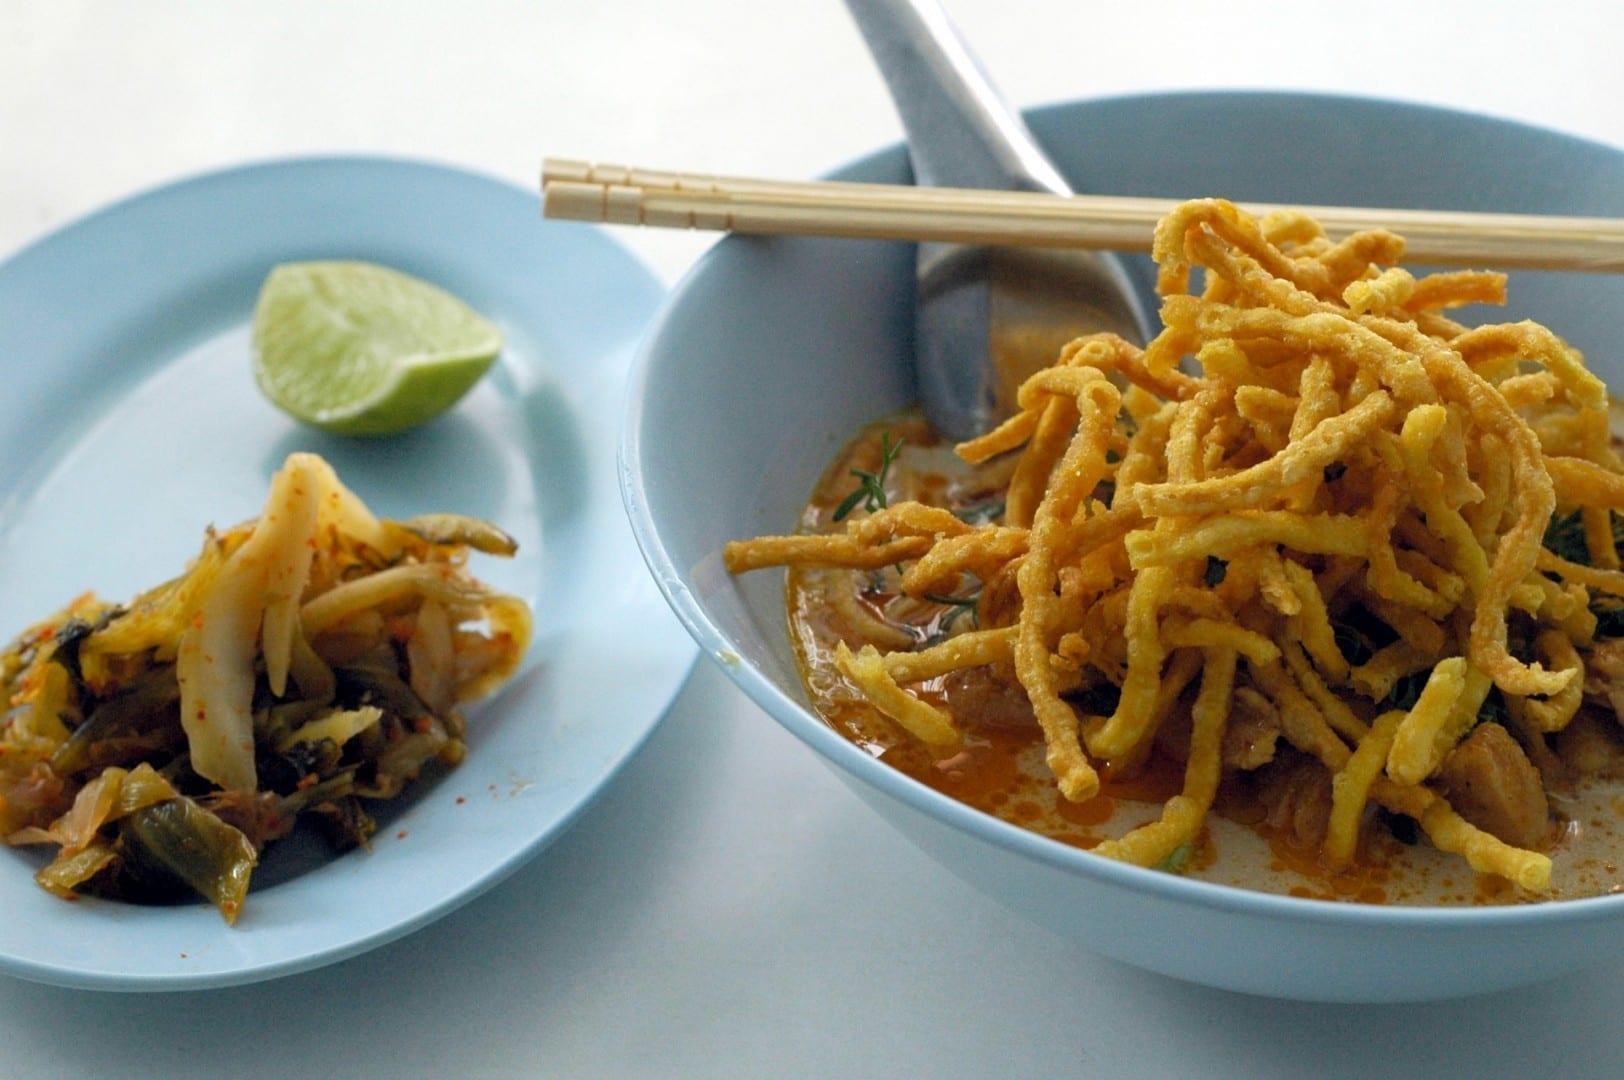 Khao soi en Por Jai Chiang Rai Tailandia